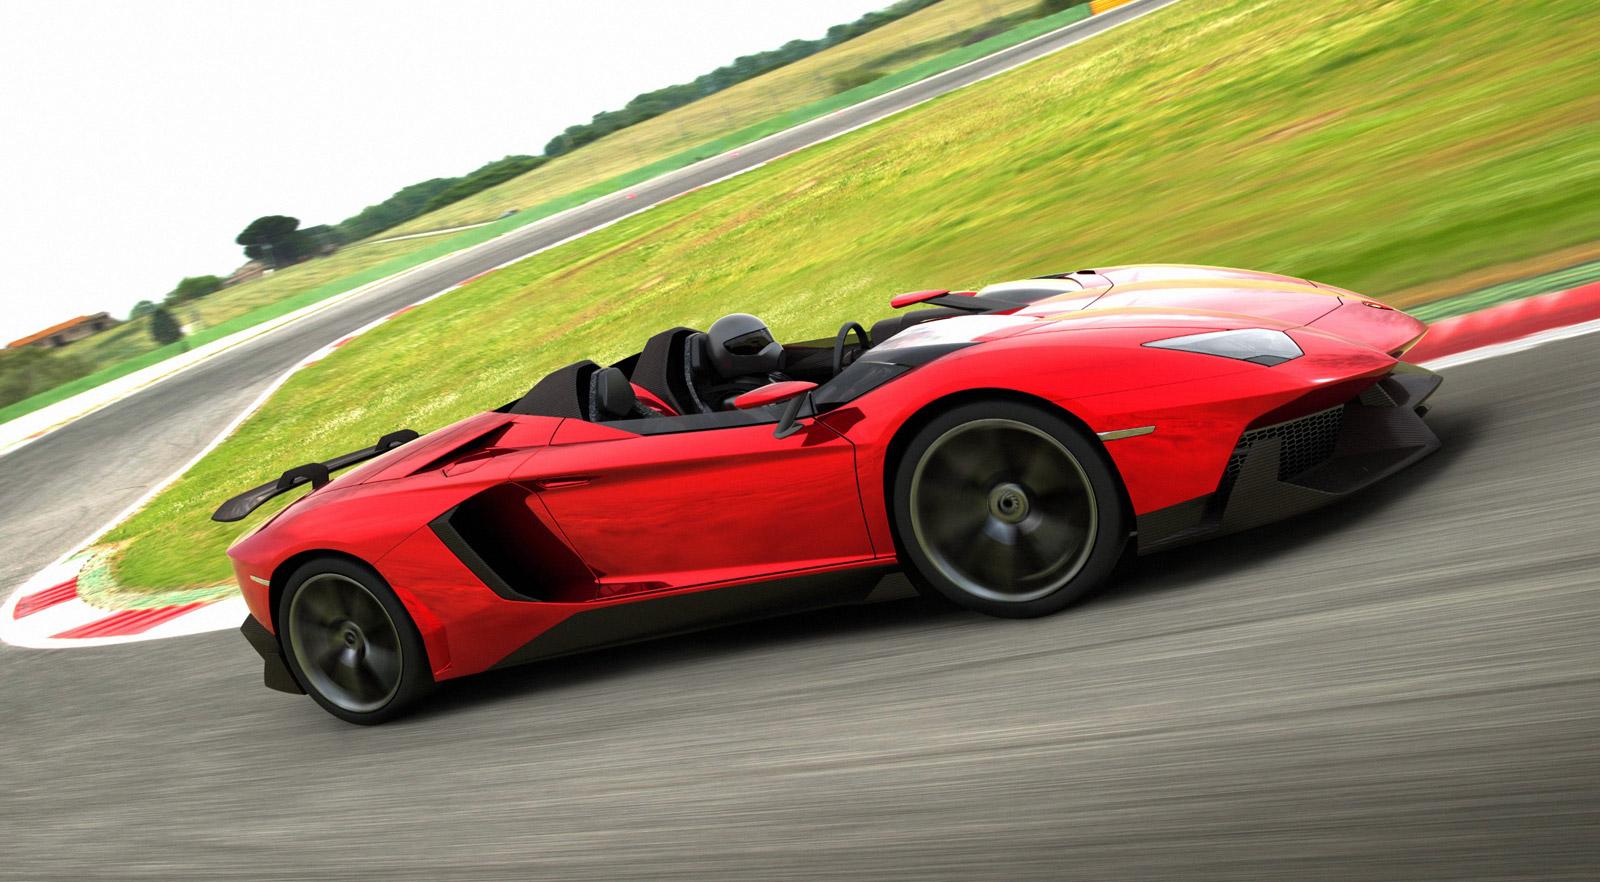 Lamborghini Aventador J 2012 Geneva Motor Show